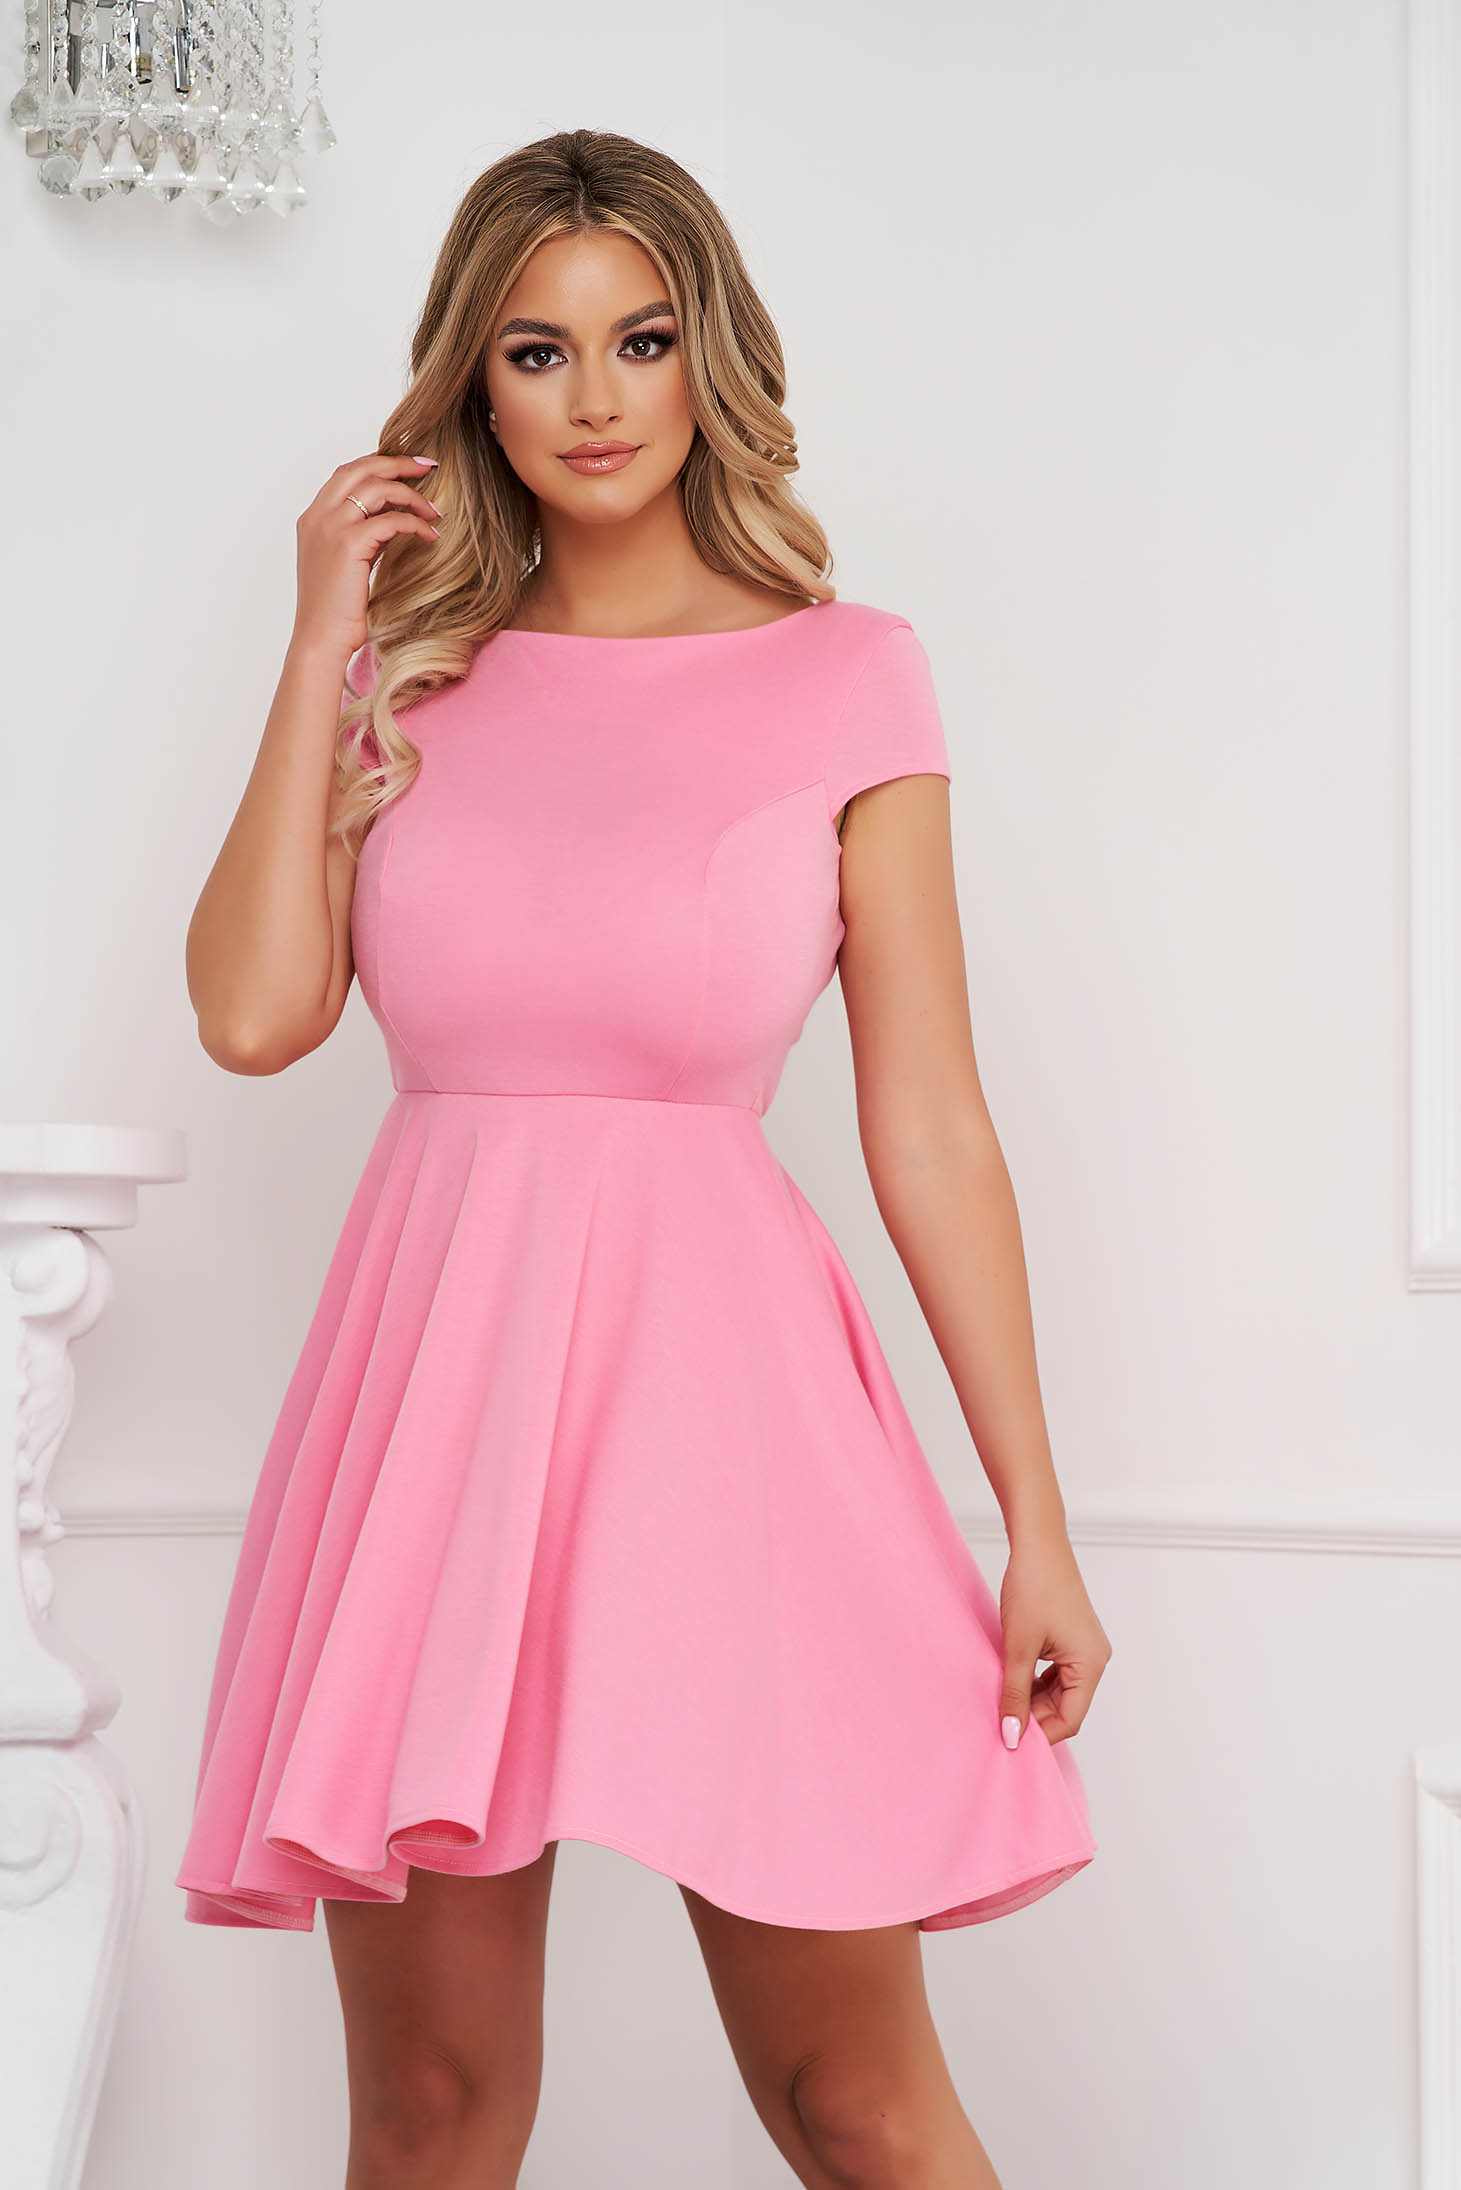 Rochie StarShinerS roz prafuit scurta in clos din material usor elastic cu spatele decupat in V